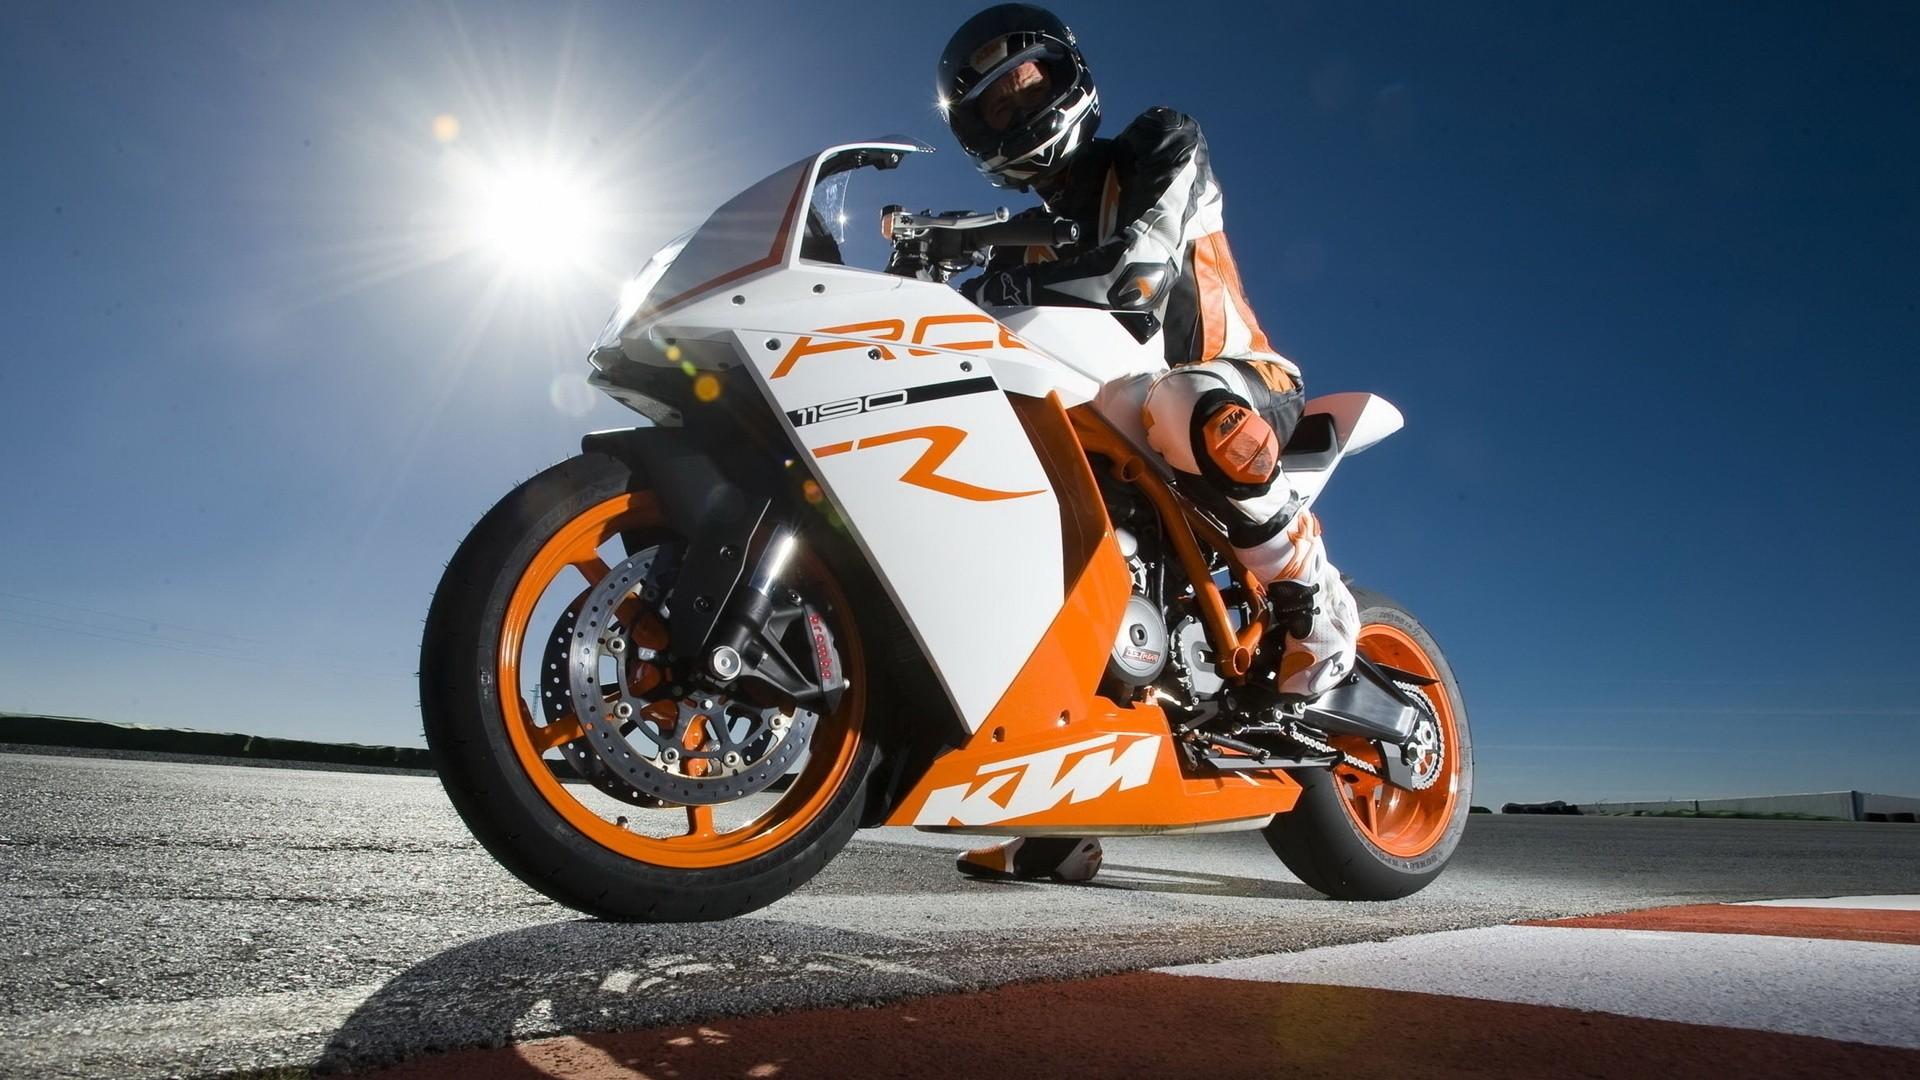 Motorcycle Full HD Wallpaper